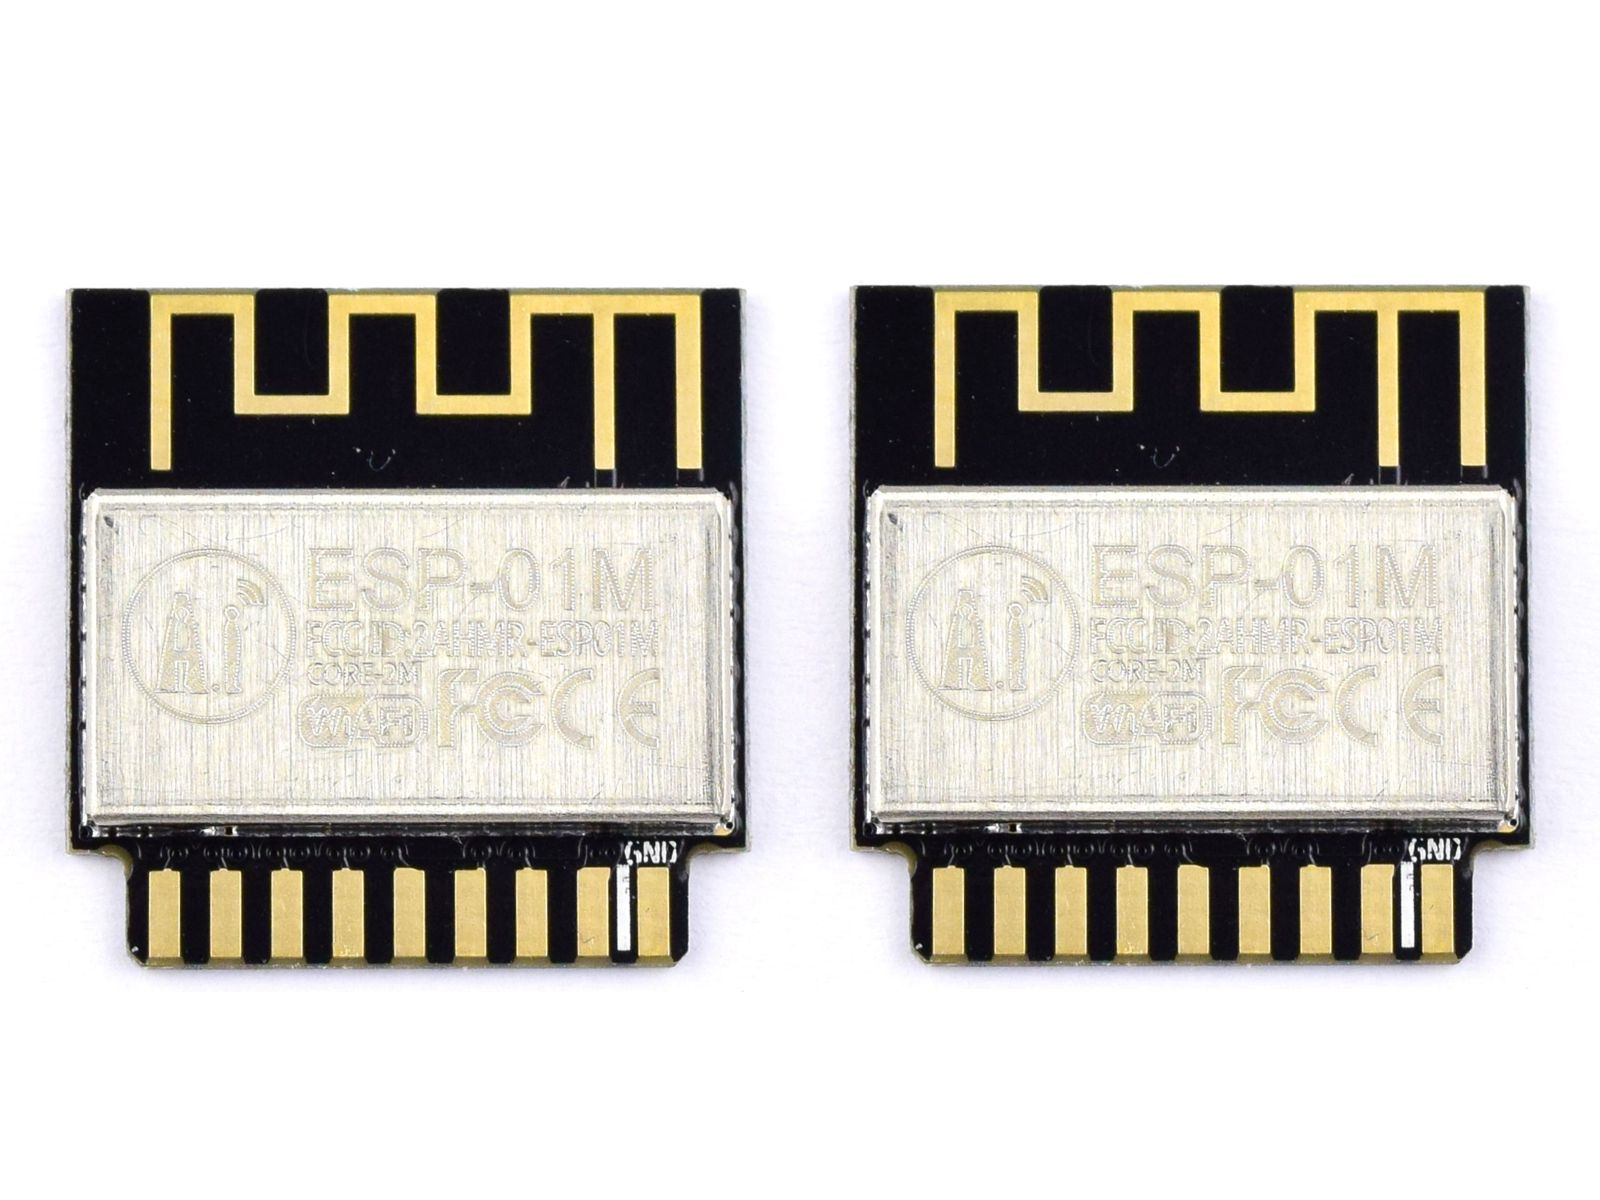 2 x Ai-Thinker ESP-01M ESP8285 – Smallest Breadboard Wi-Fi IoT Module